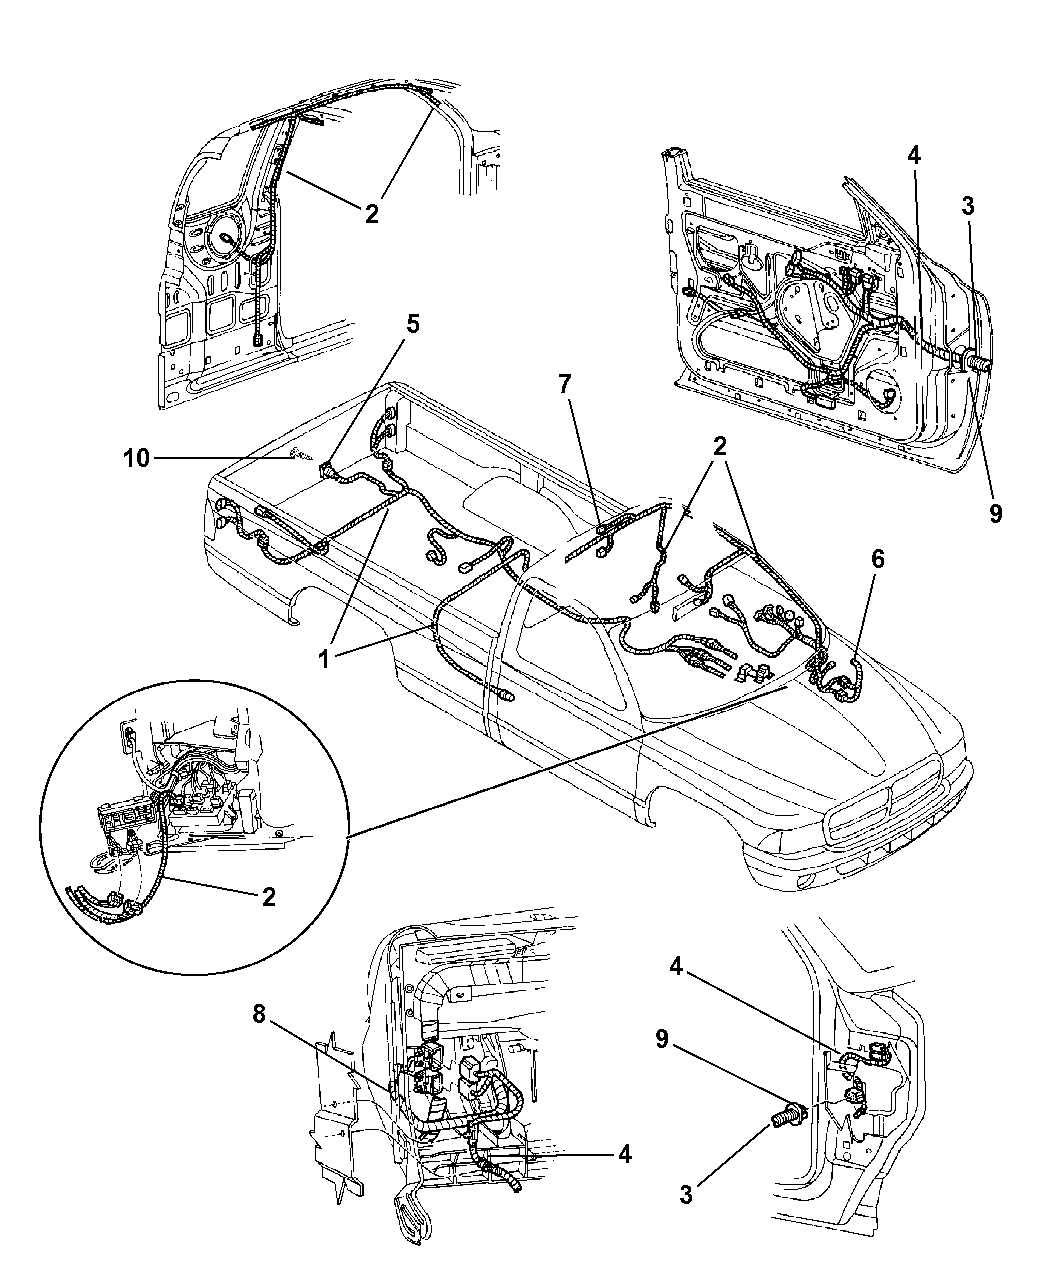 1999 Dodge Dakota Electrical Wiring Library Diagram Body Accessories